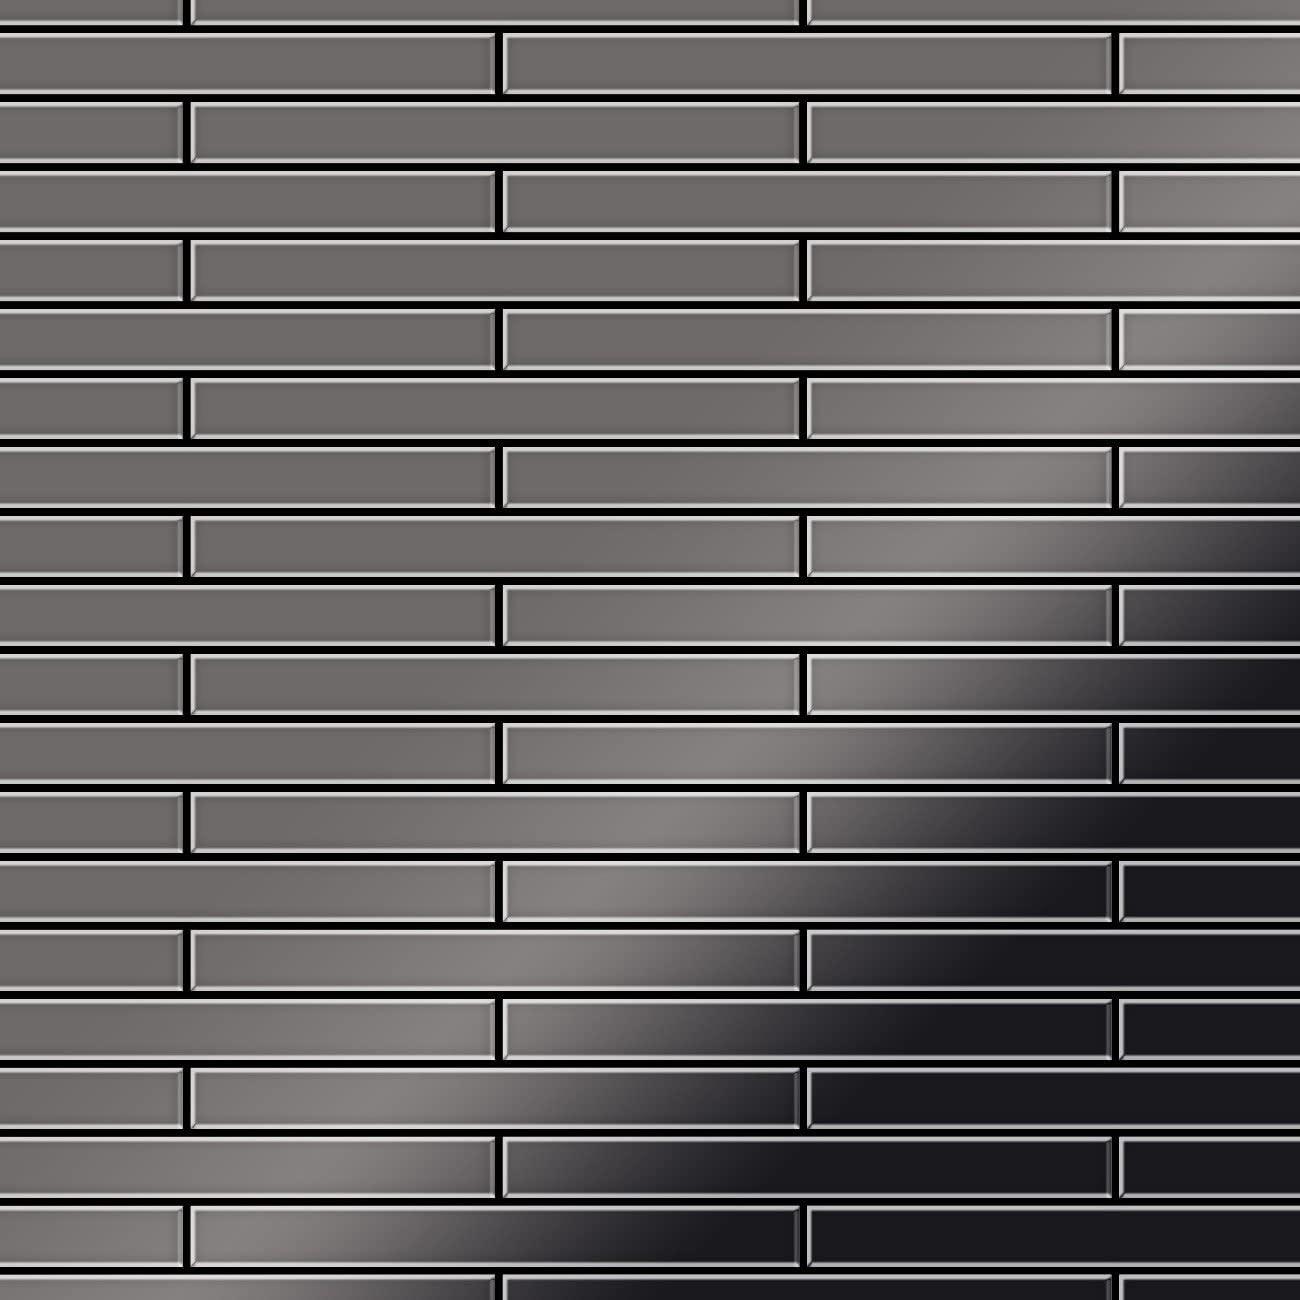 Mosaic Tile massiv Metal Titanium Smoke Mirror Dark Grey 1.6mm Thick ALLOY Deedee-Ti-SM